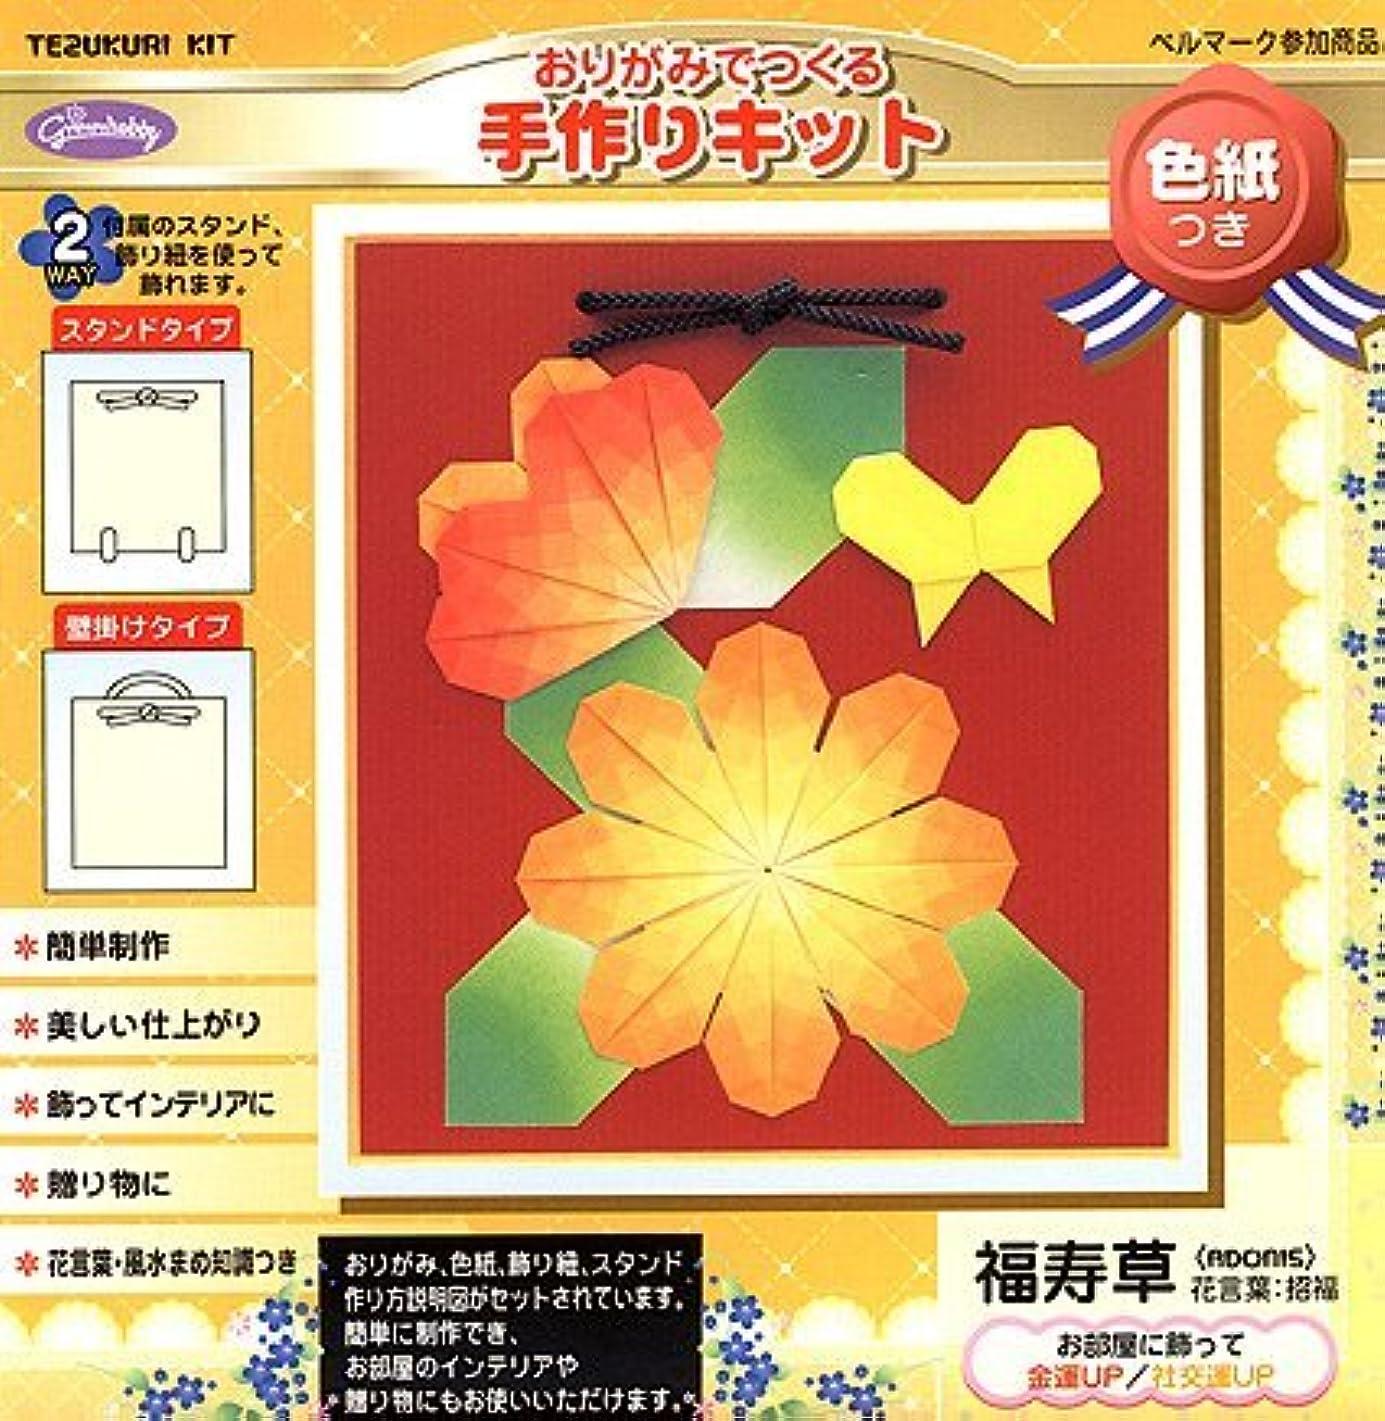 Origami Tezukuri Kit- Adonis